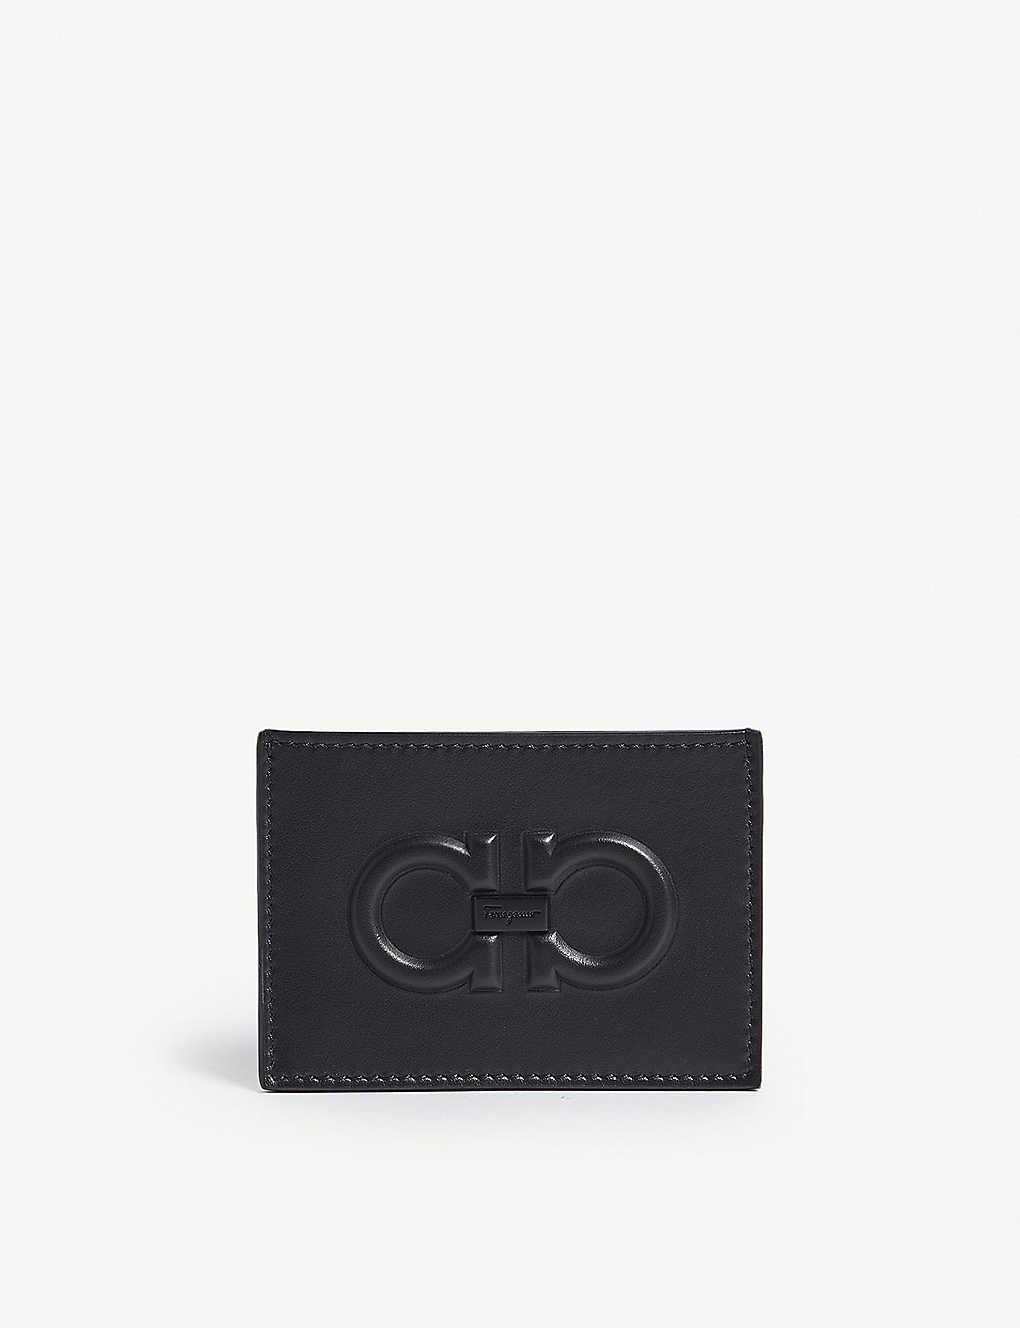 quality design 4e793 bf597 SALVATORE FERRAGAMO - Embossed Gancio leather card holder ...